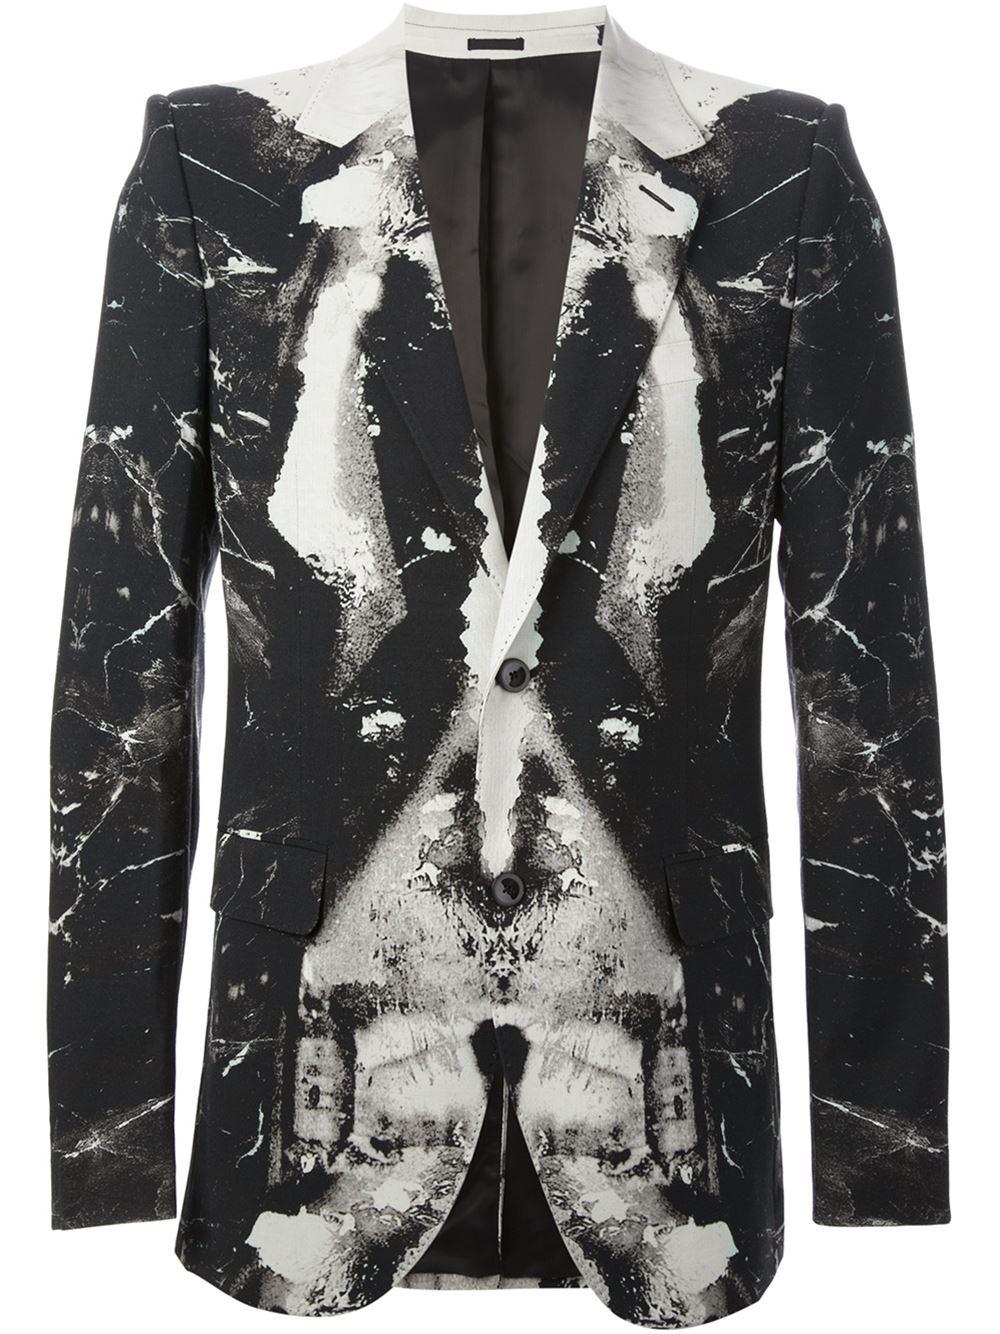 Alexander mcqueen Graphic Print Blazer in Black for Men | Lyst